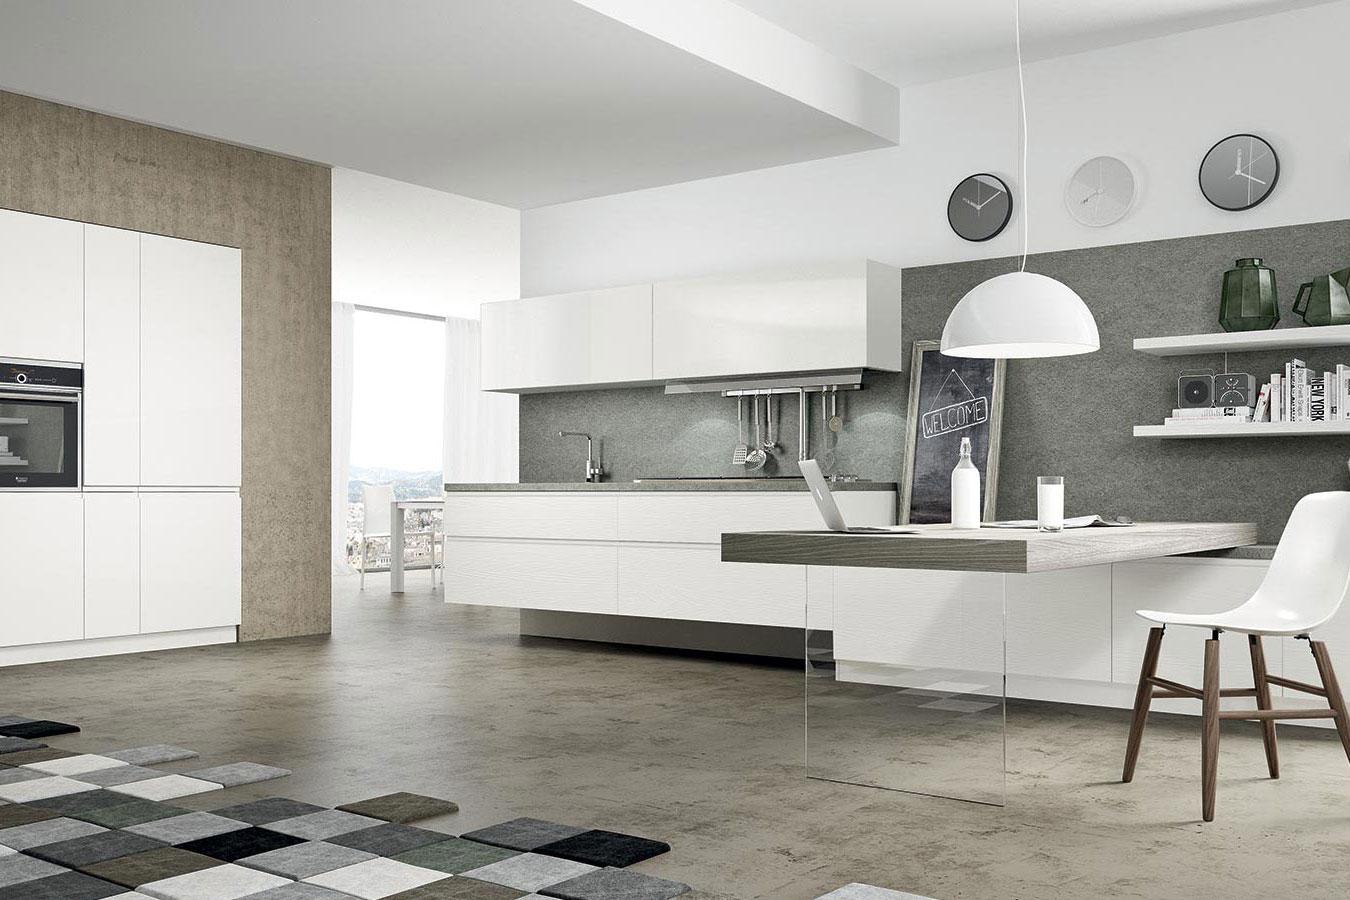 Cucina wega di arredo3 righetti mobili novara for Mobili cucine moderne componibili